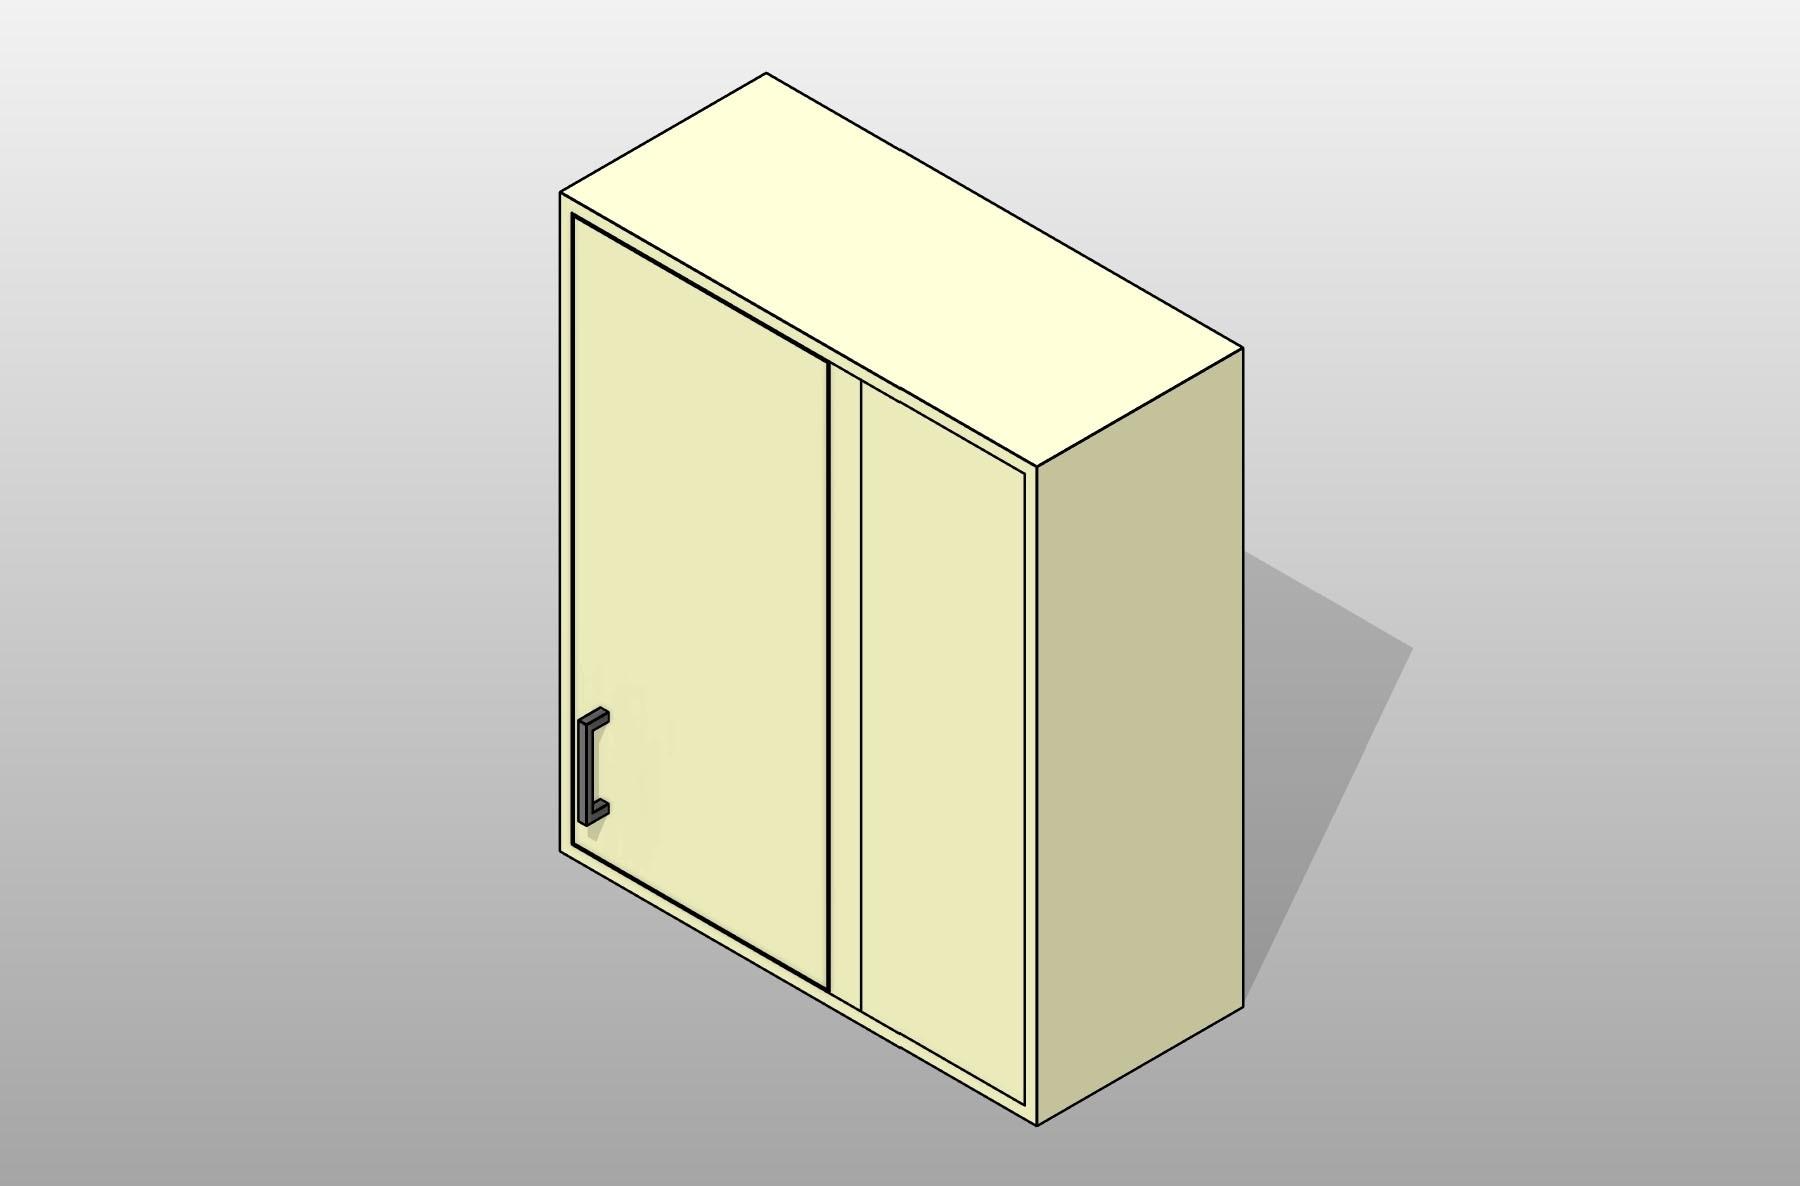 ssg-cabinet-lab-wall-dead-corner-pcs-large